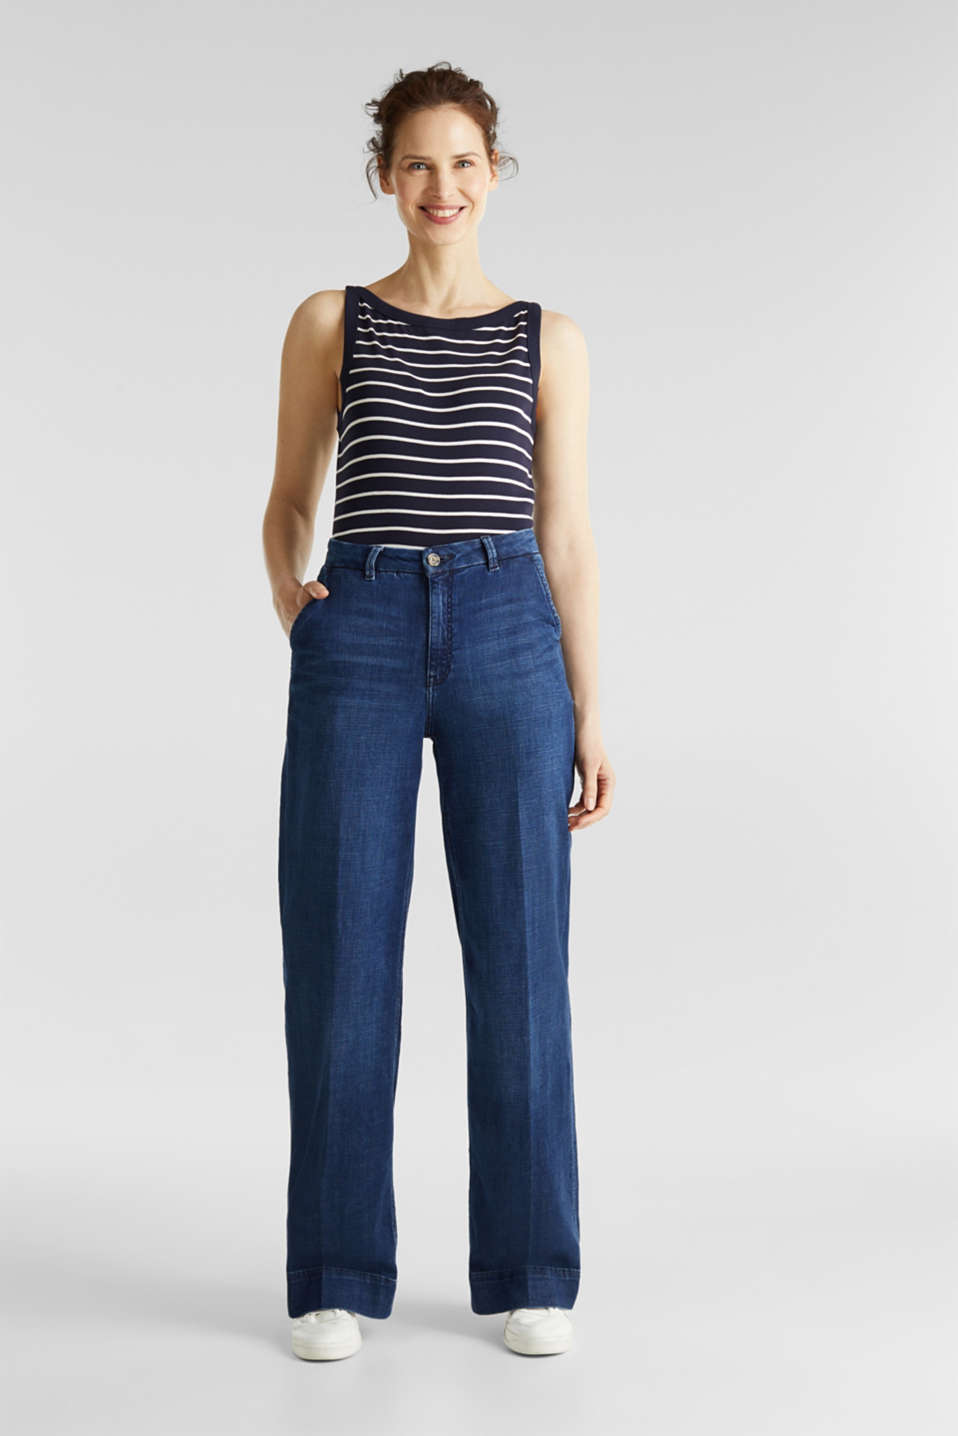 Striped T-shirt, organic cotton, NAVY, detail image number 1